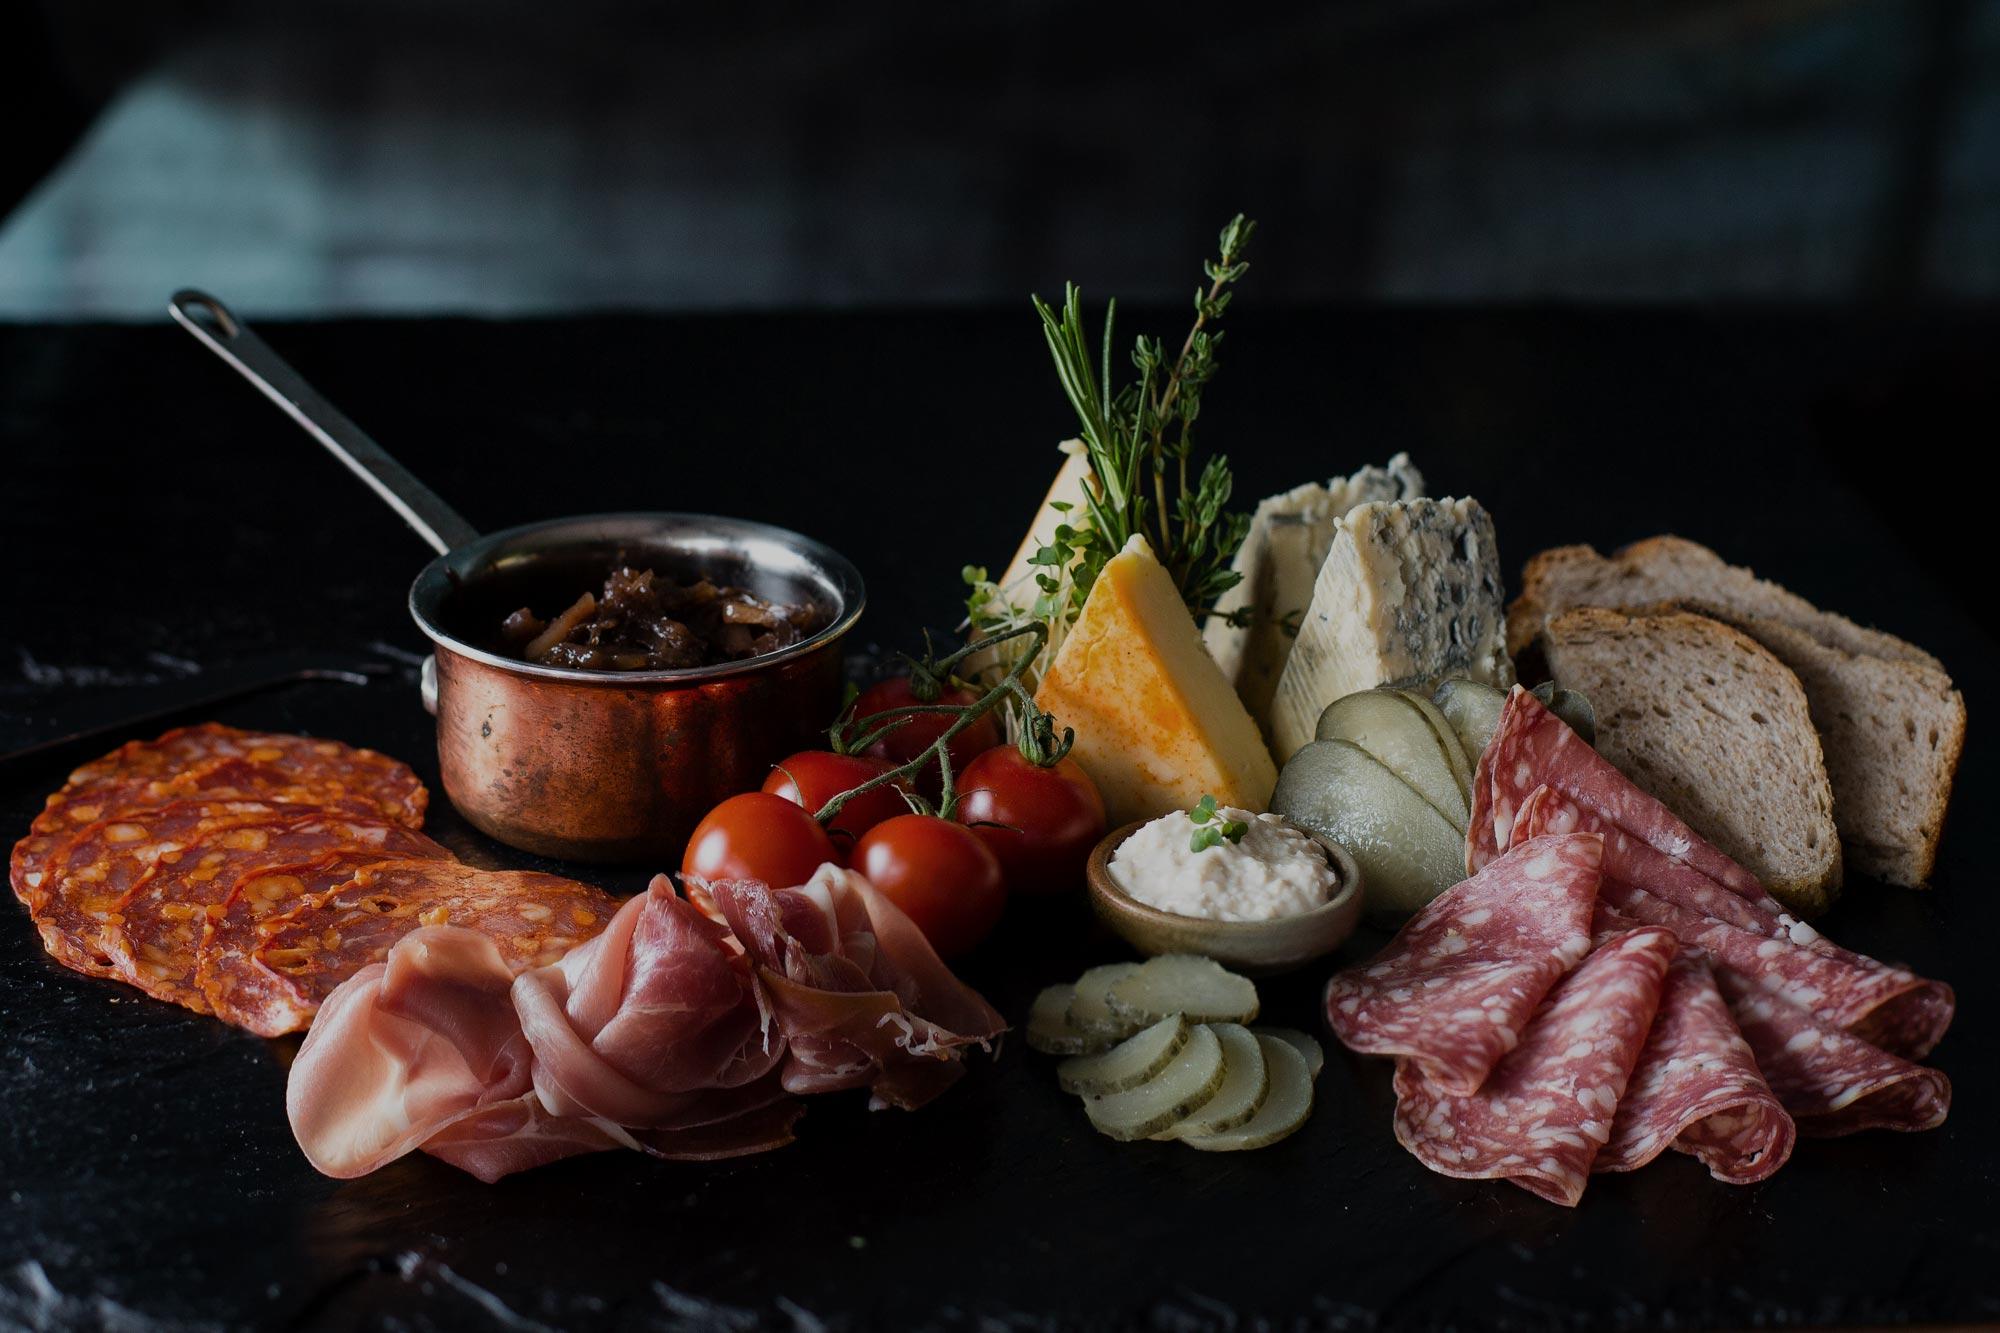 045 Master Chef Web 2019© Anita Murphy 2019_LO.jpg